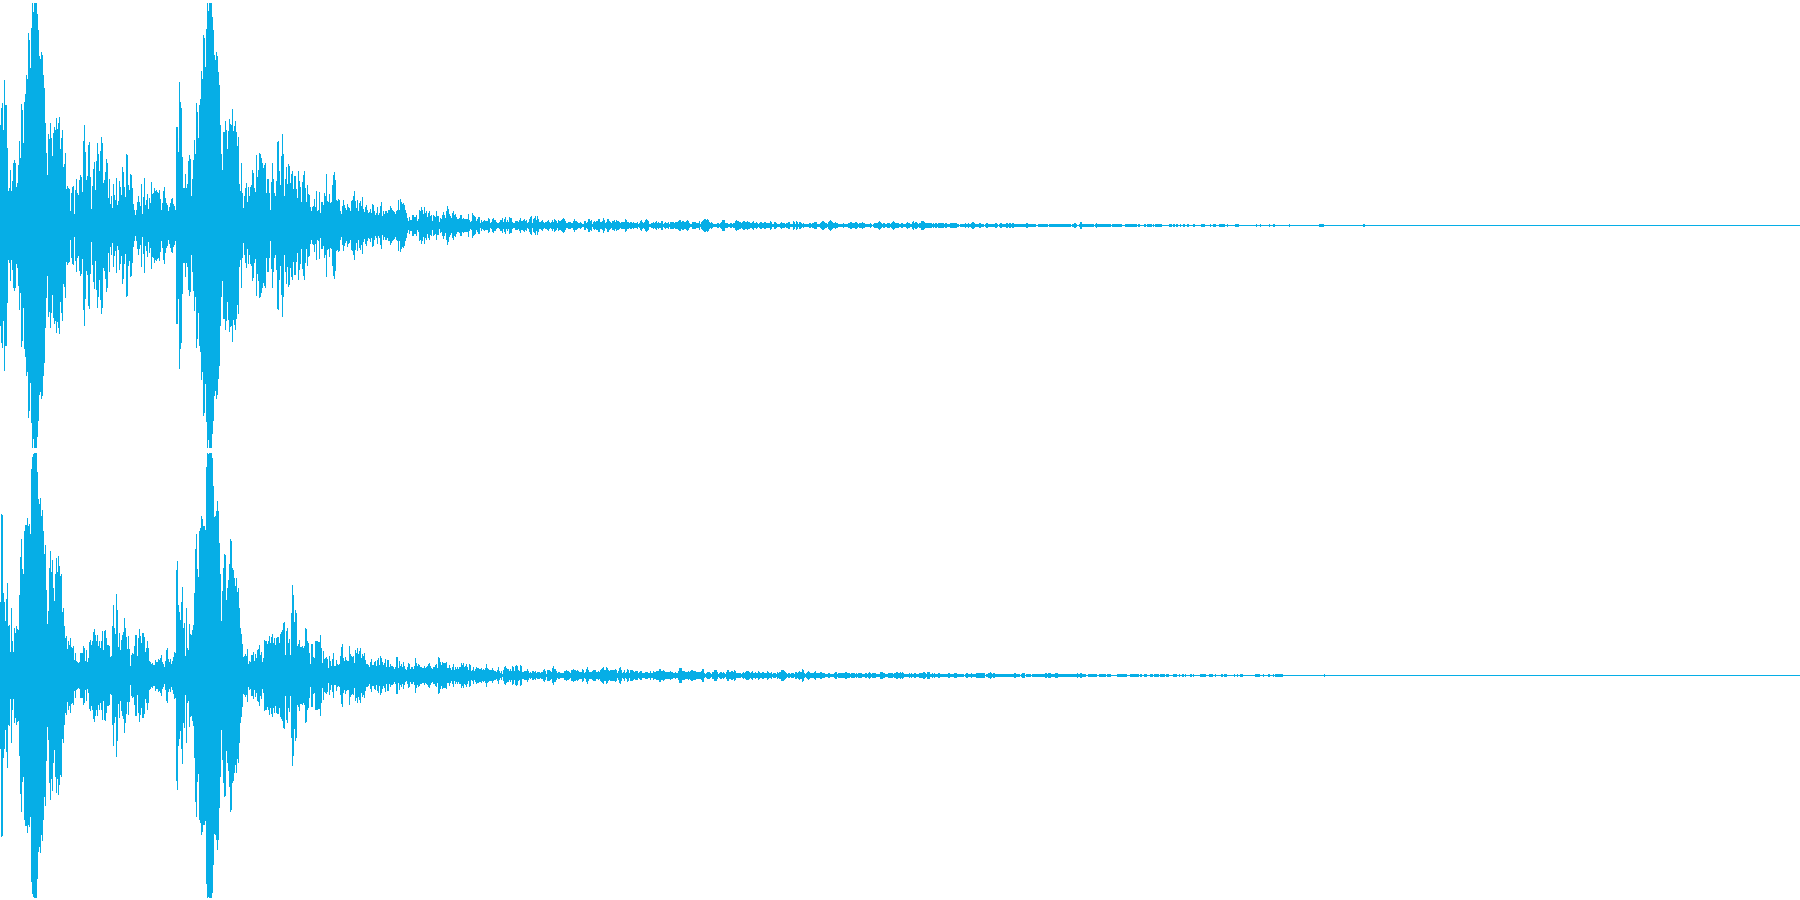 Acid ビチャっとしたコマンド音 の再生済みの波形